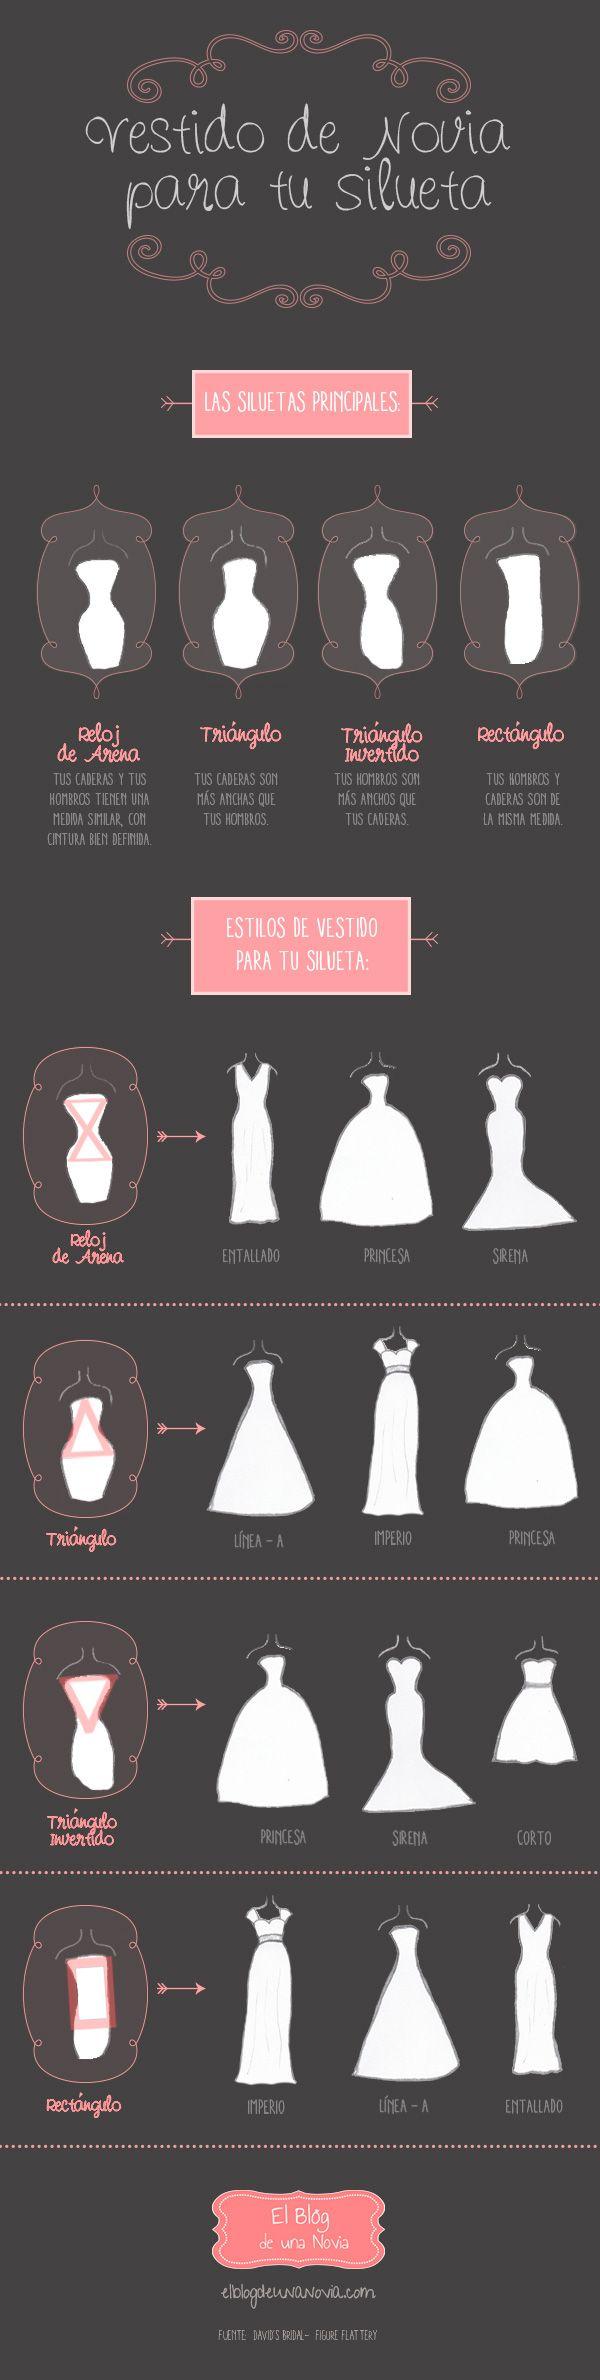 Vestido de Novia para tu Silueta - Escoge un vestido de novia que resalte tu…